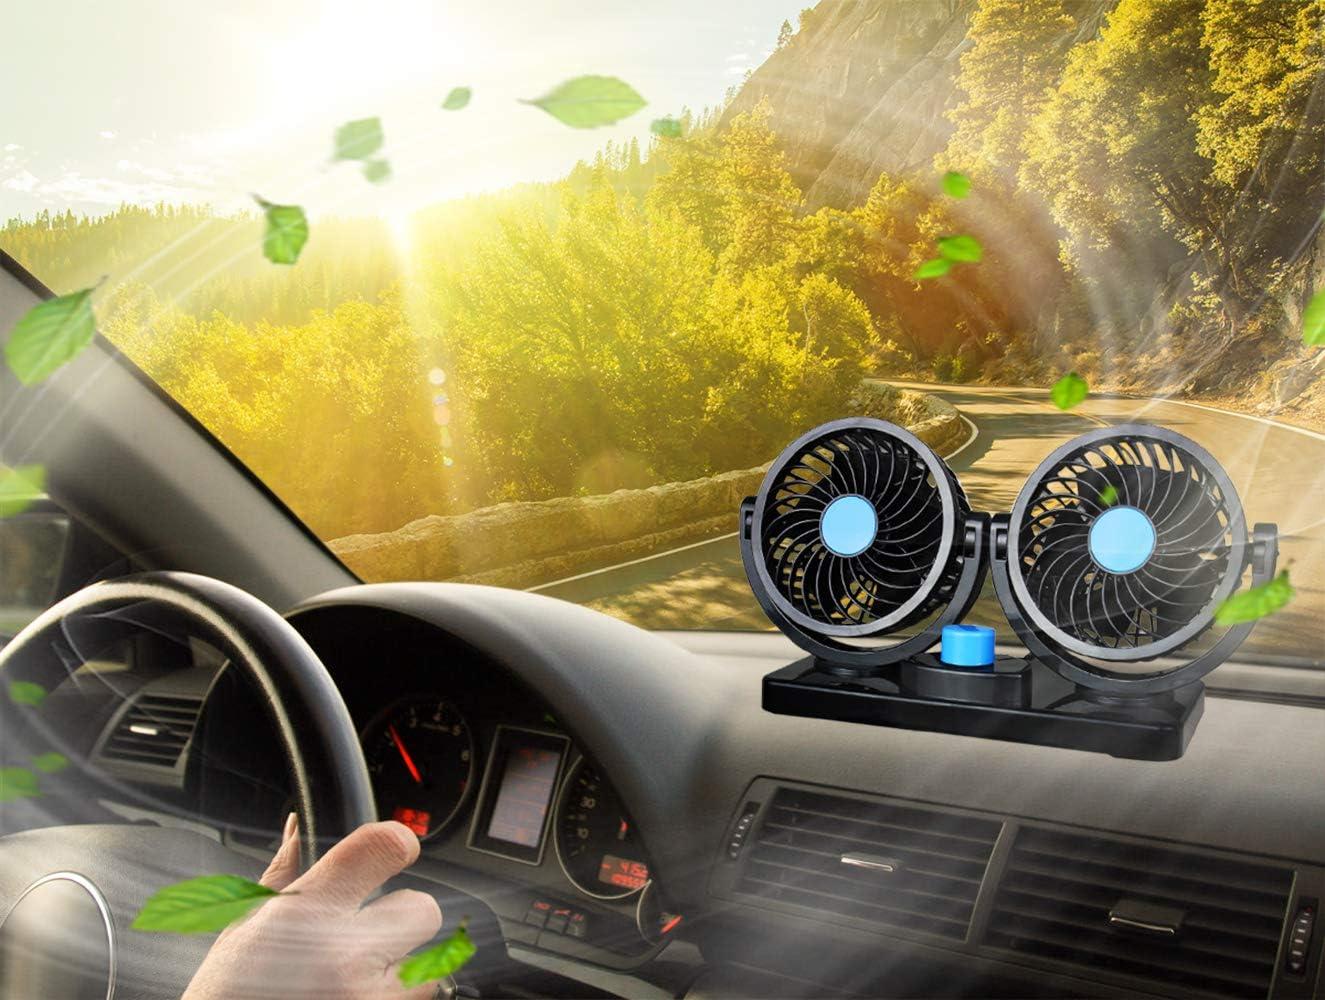 Dual Head 2 Speed 12V Cooling Air Circulator Electric Car Fan Latest 360 Degree Rotatable Auto Fan for Sedan SUV//RV//Boat//Auto Vehicles